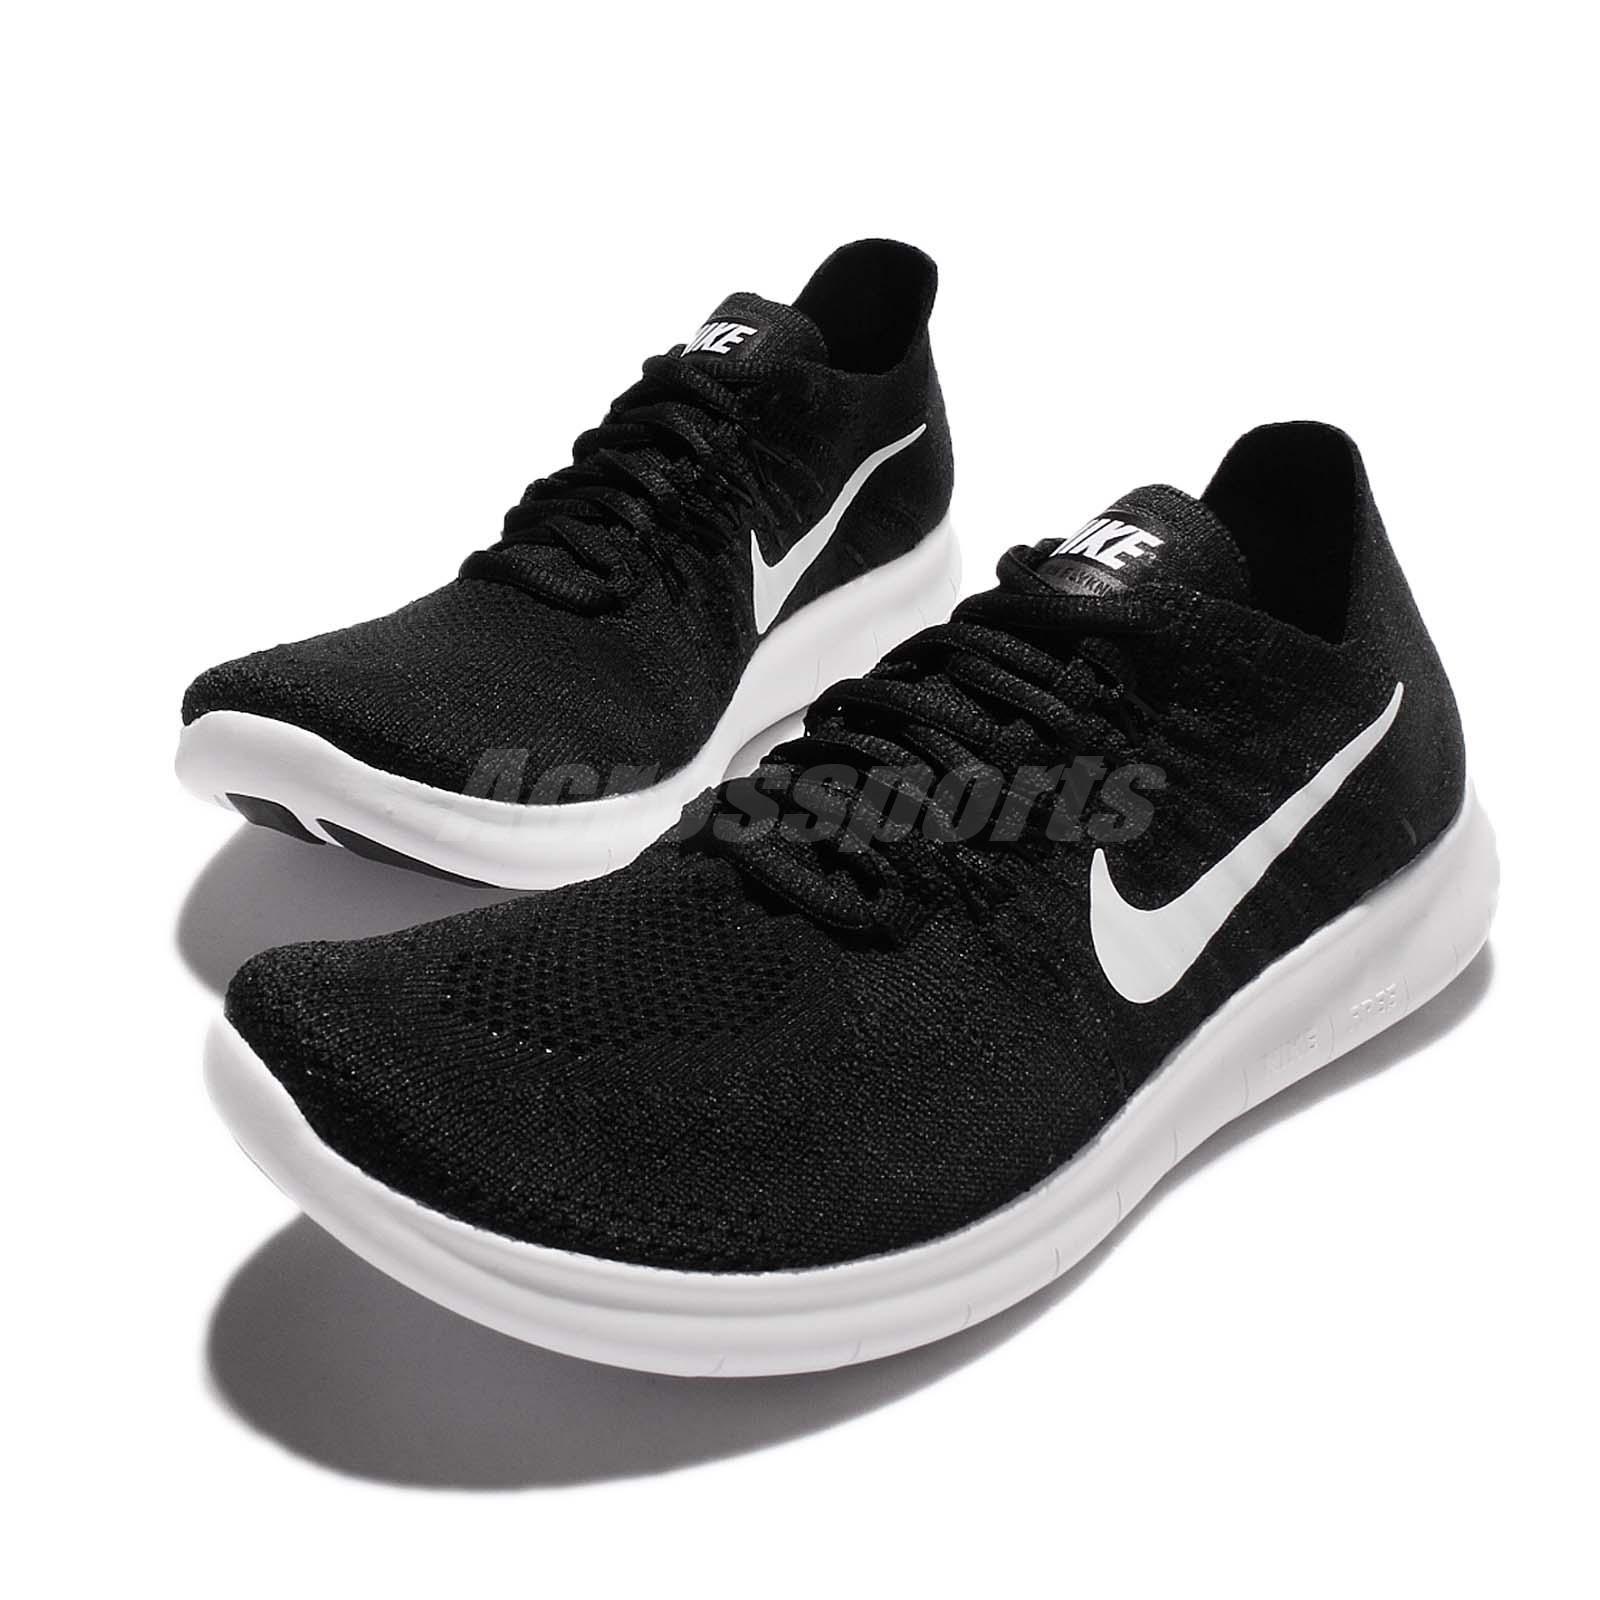 Nike WMNS Free RN Flyknit 2017 [880844-001] Women Running Shoes Black/White